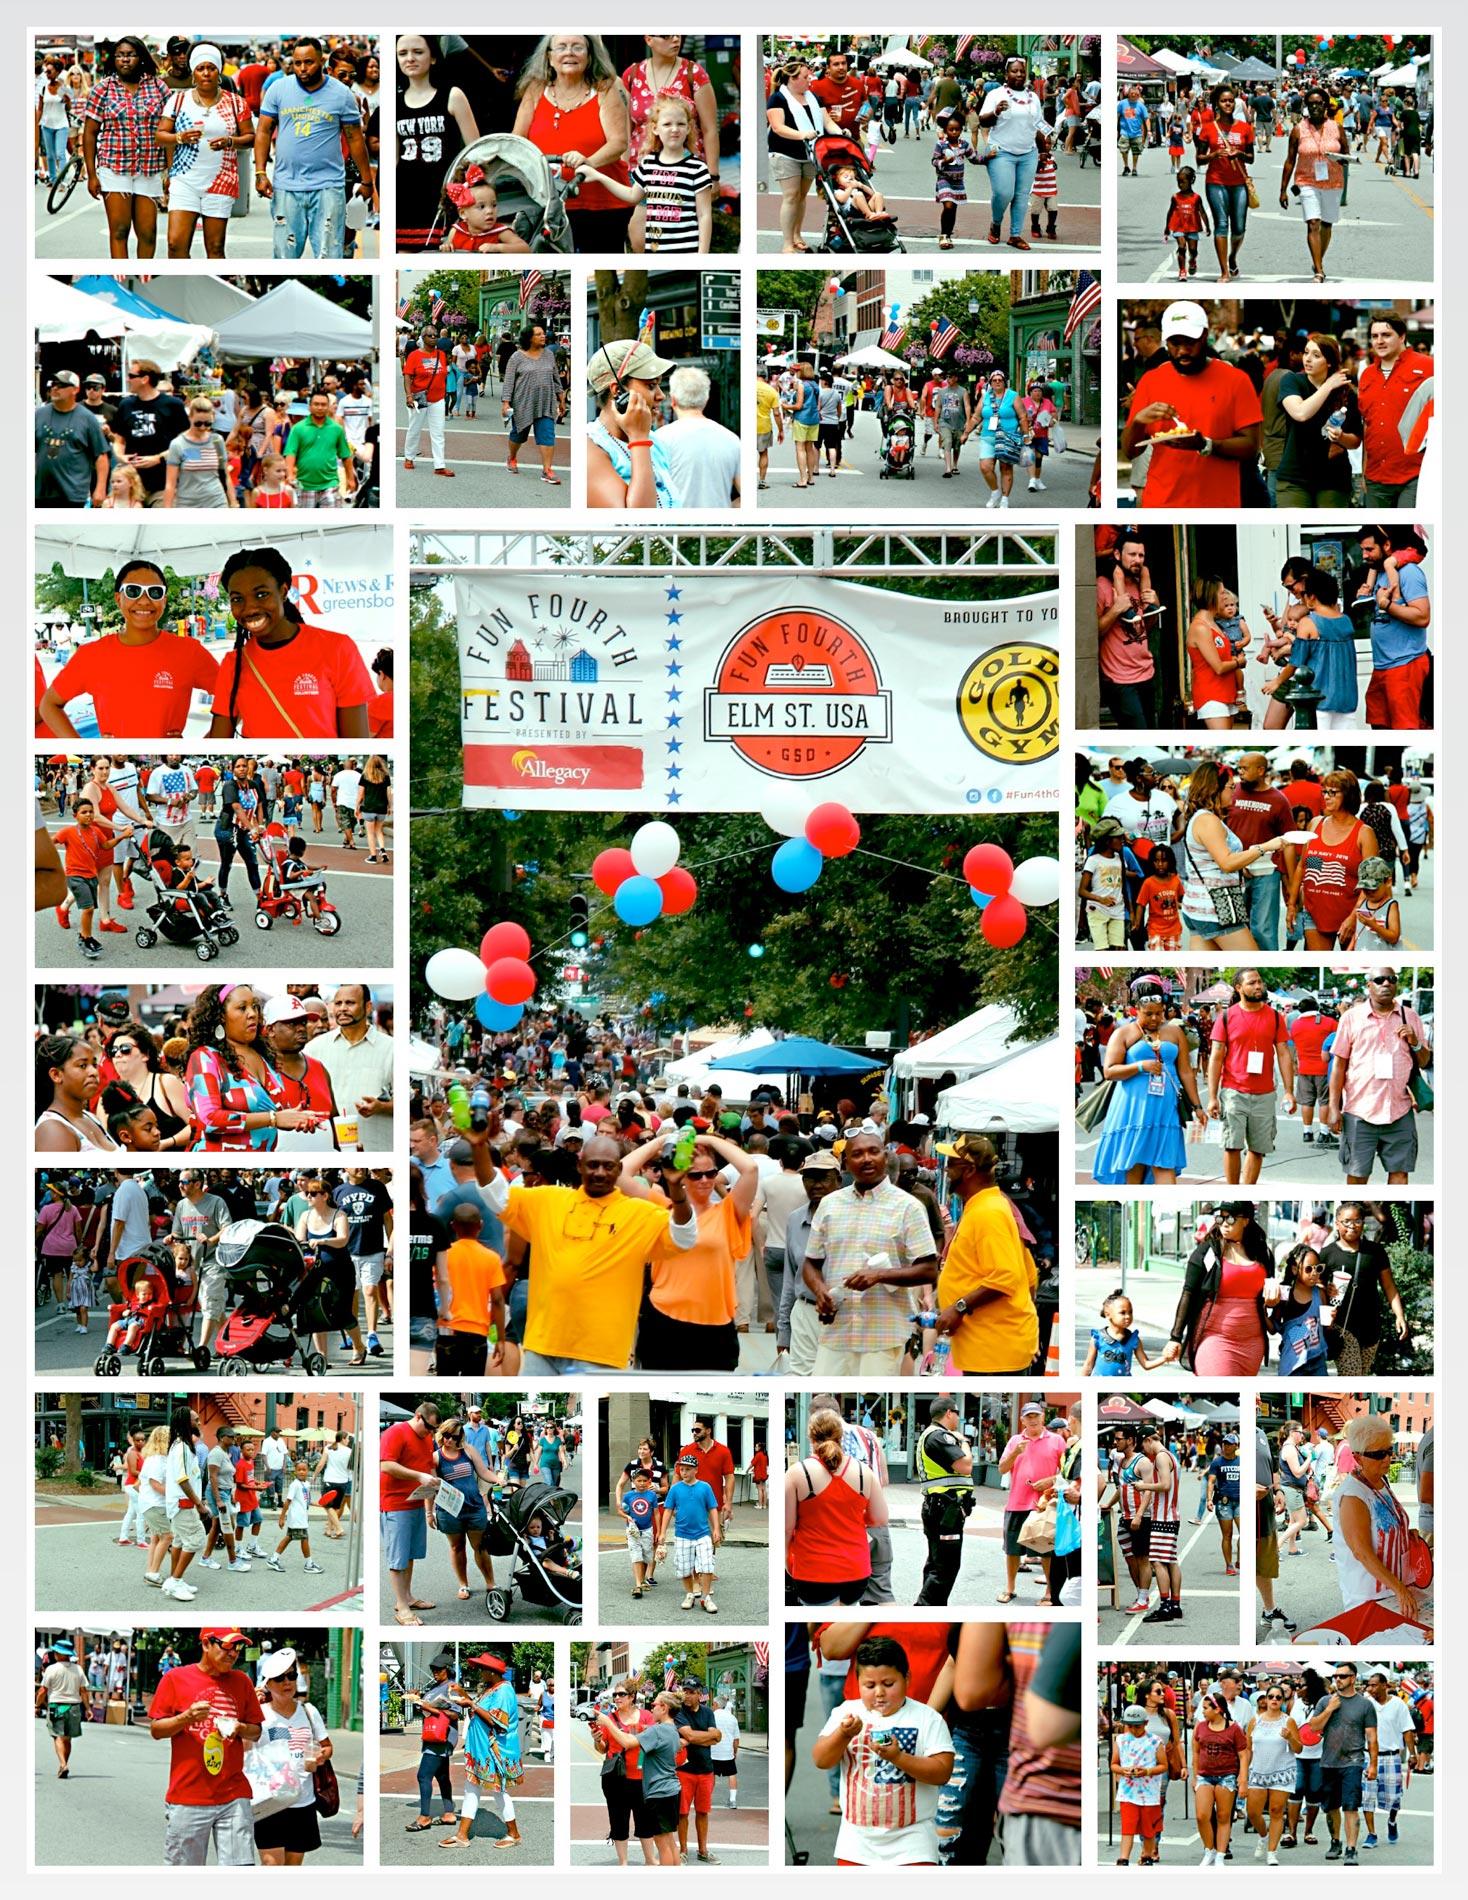 Greensboro_July_4_Festival.jpg